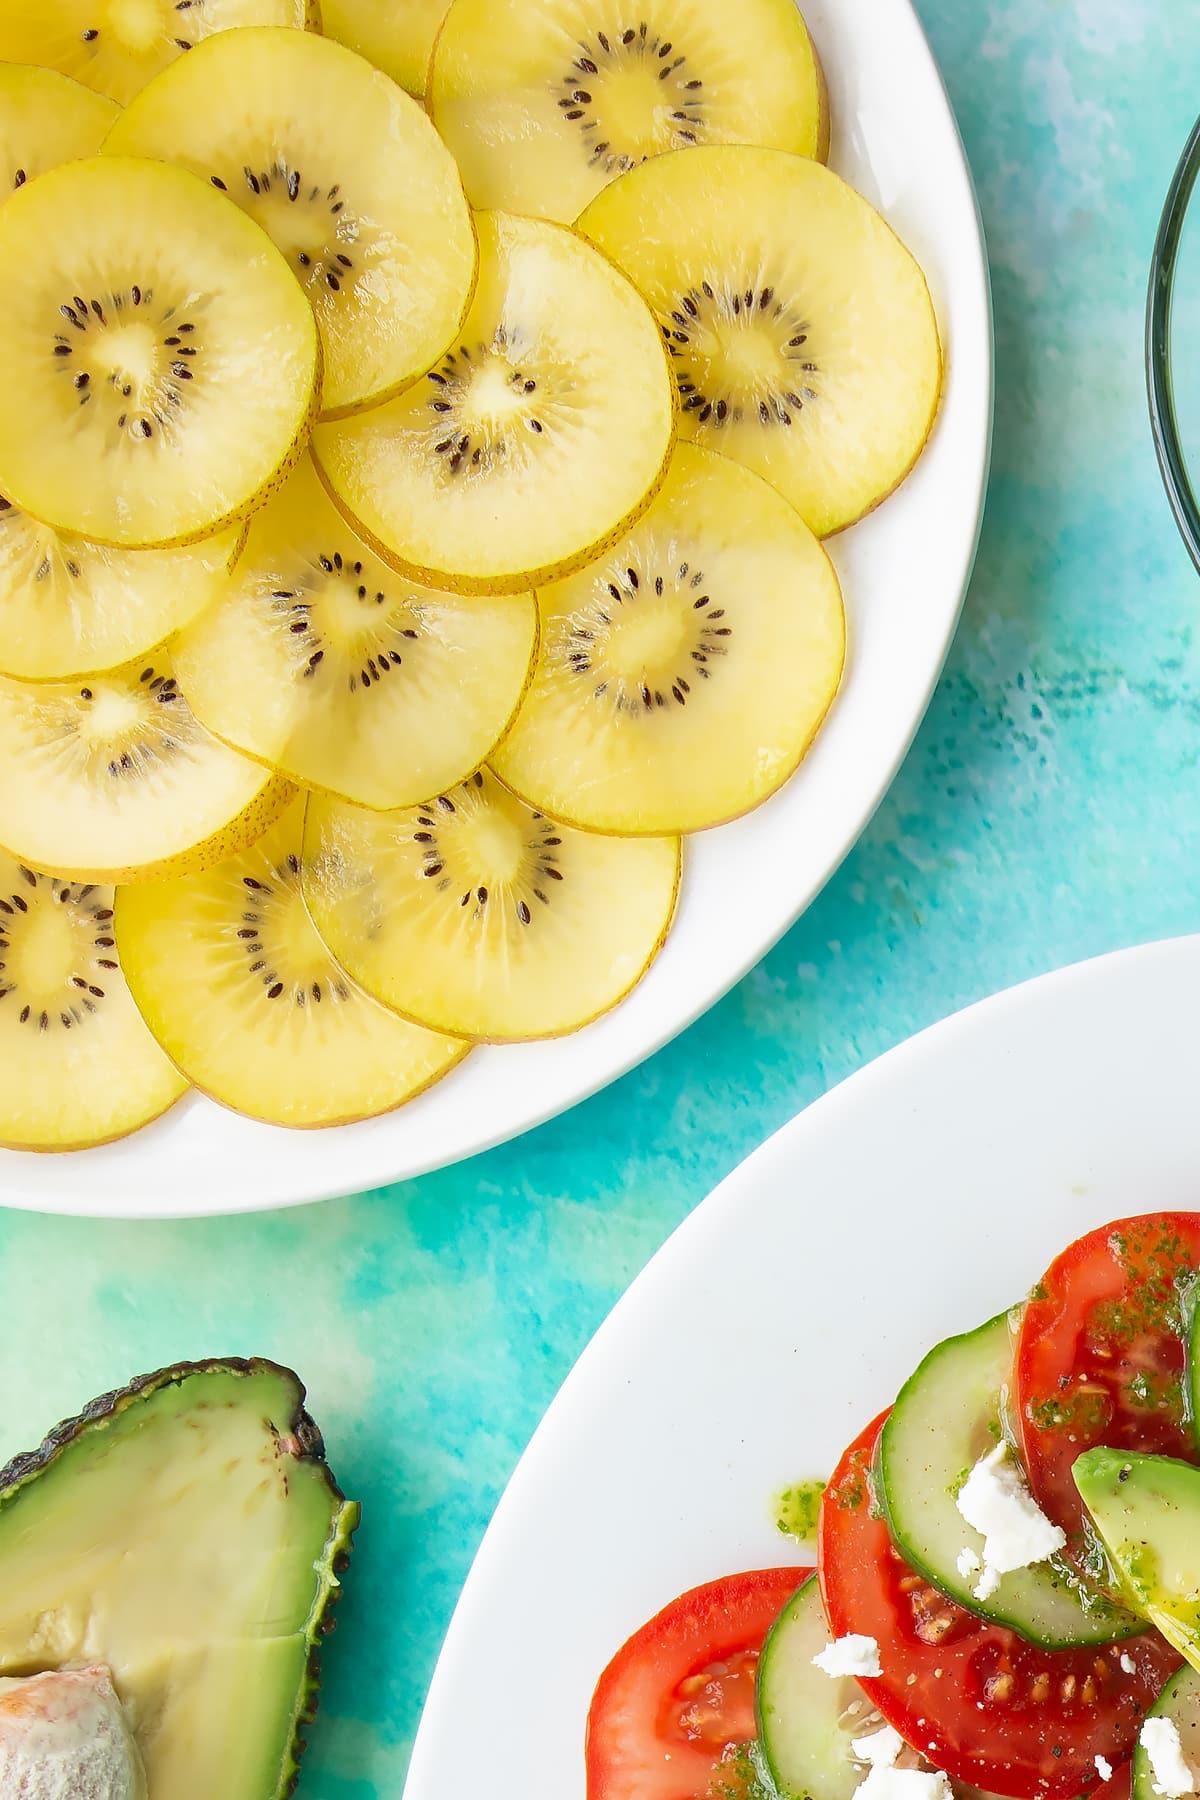 Sliced golden kiwis on a white plate beside a kiwi feta salad.